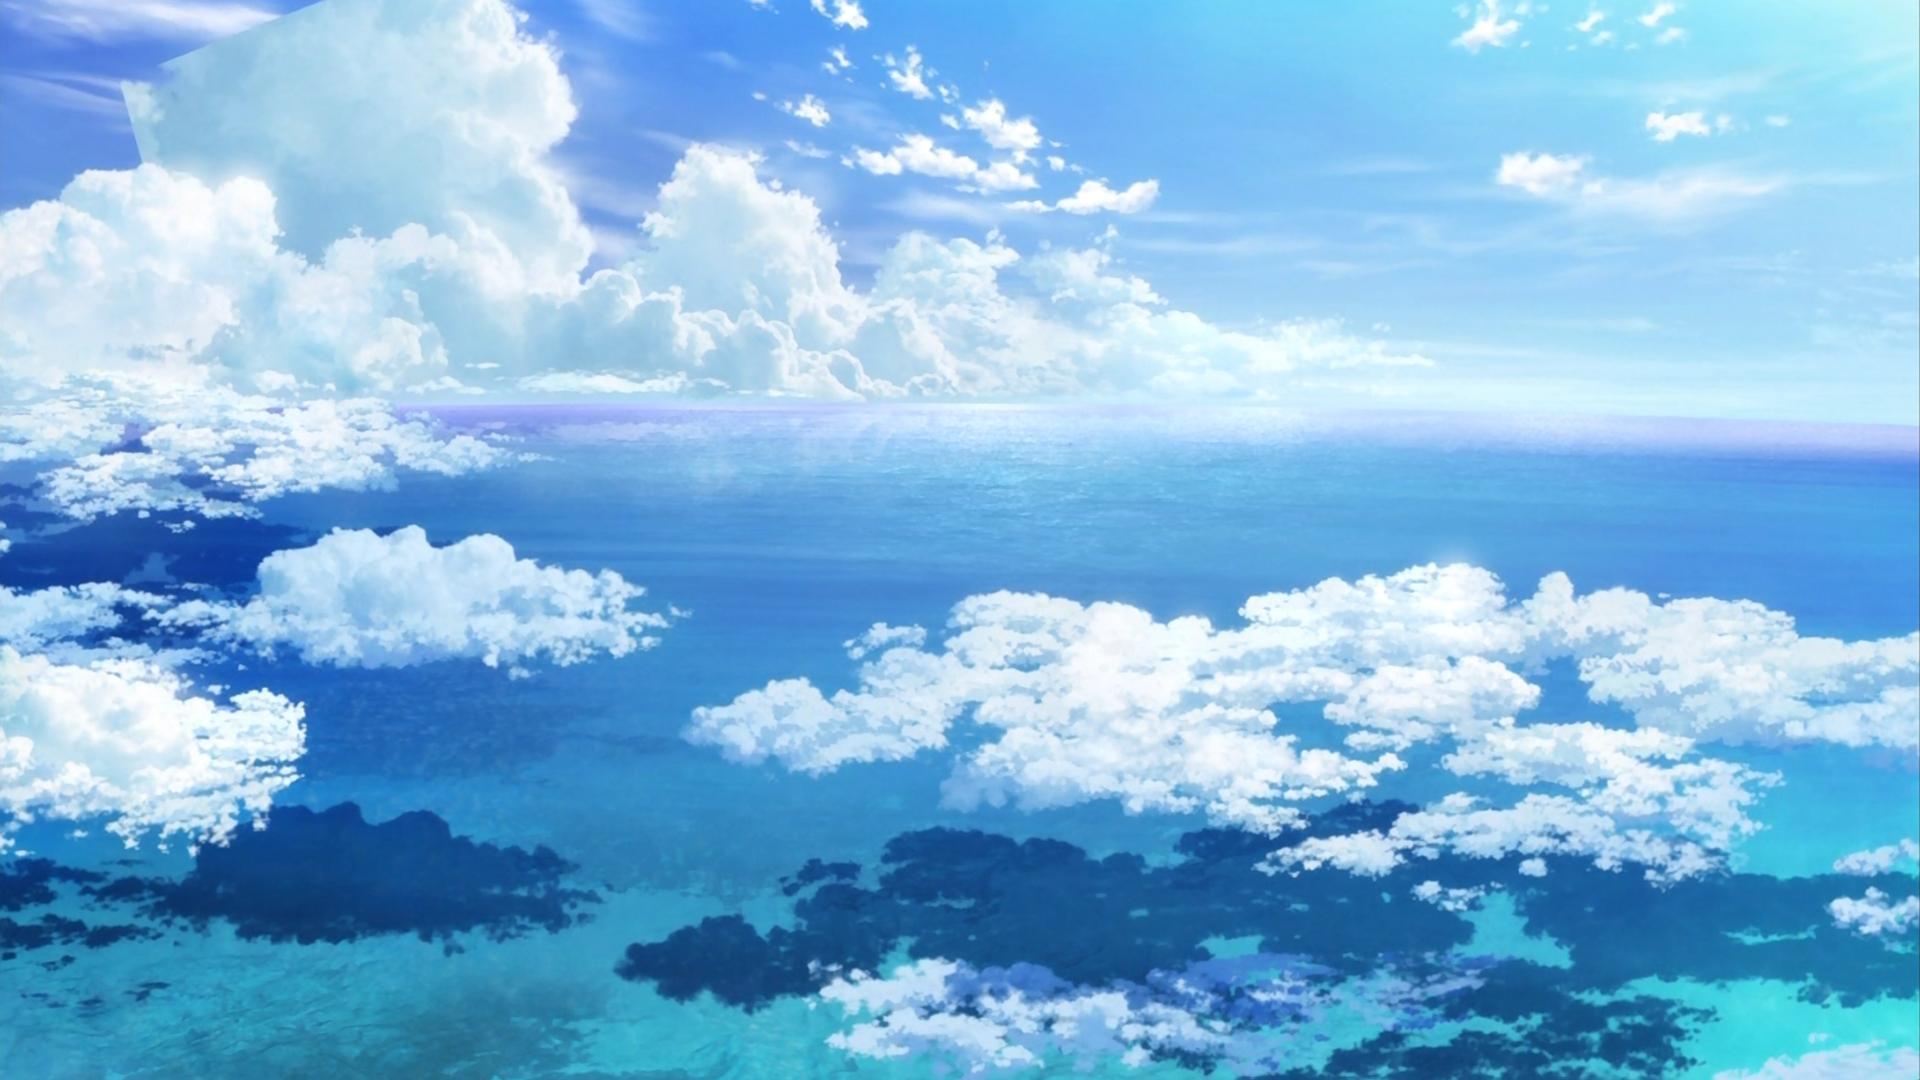 Anime Sky Wallpaper Hd Trendsmeup